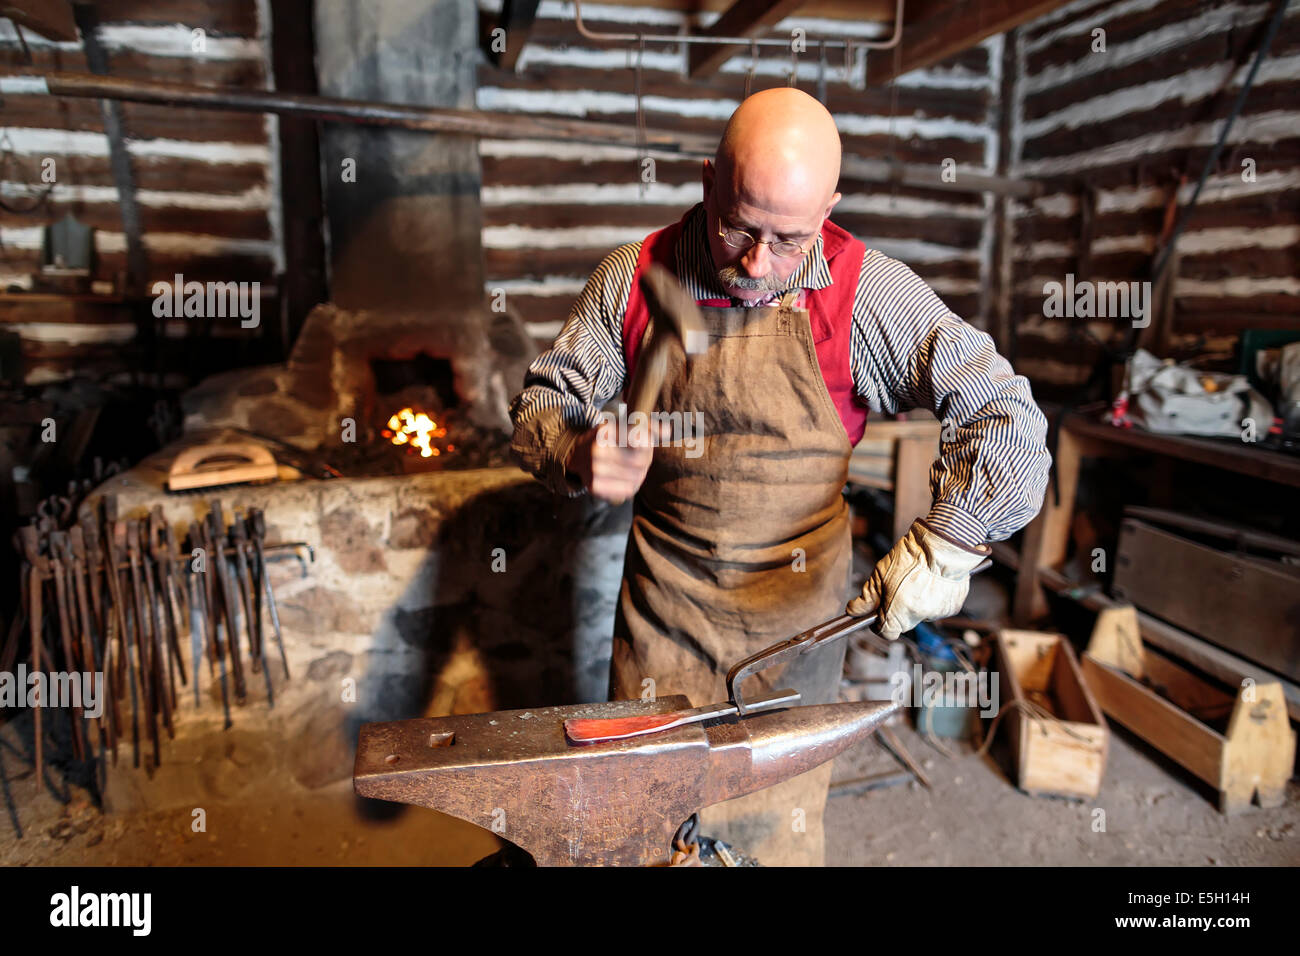 Blacksmith hammering on anvil, Festival du Voyageur, Winnipeg, Manitoba, Canada - Stock Image